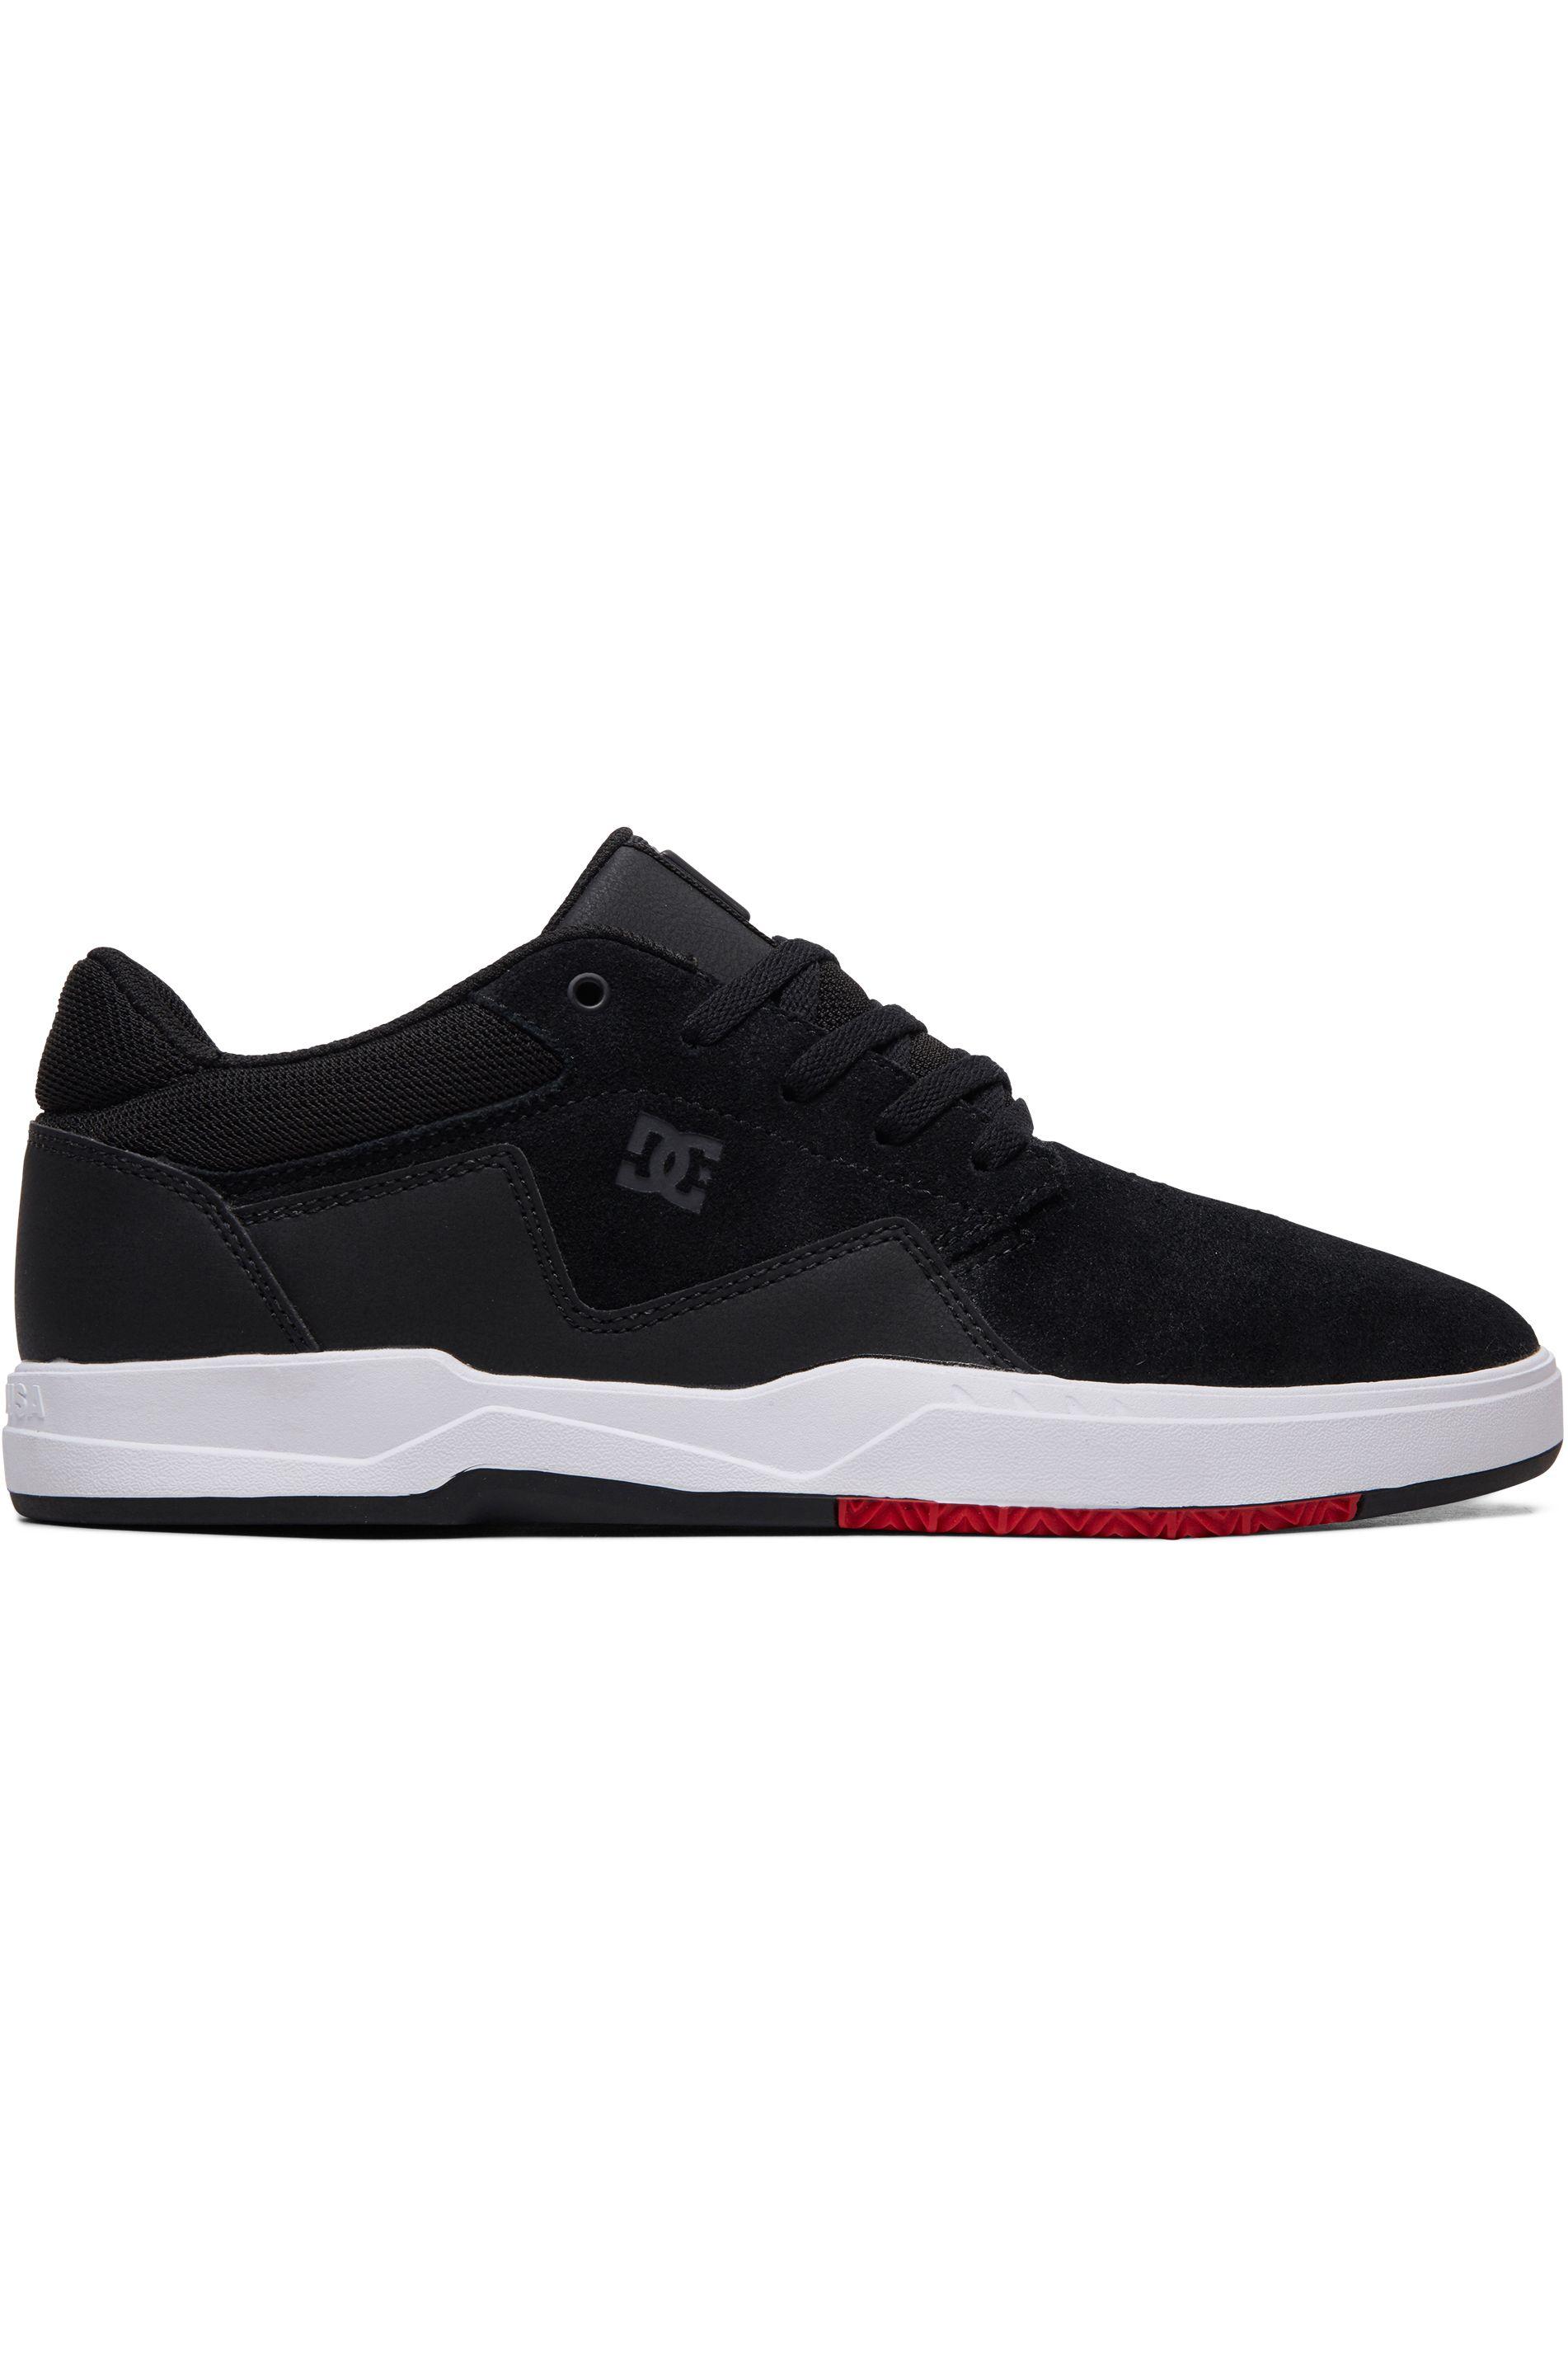 DC Shoes Shoes BARKSDALE Black/Grey